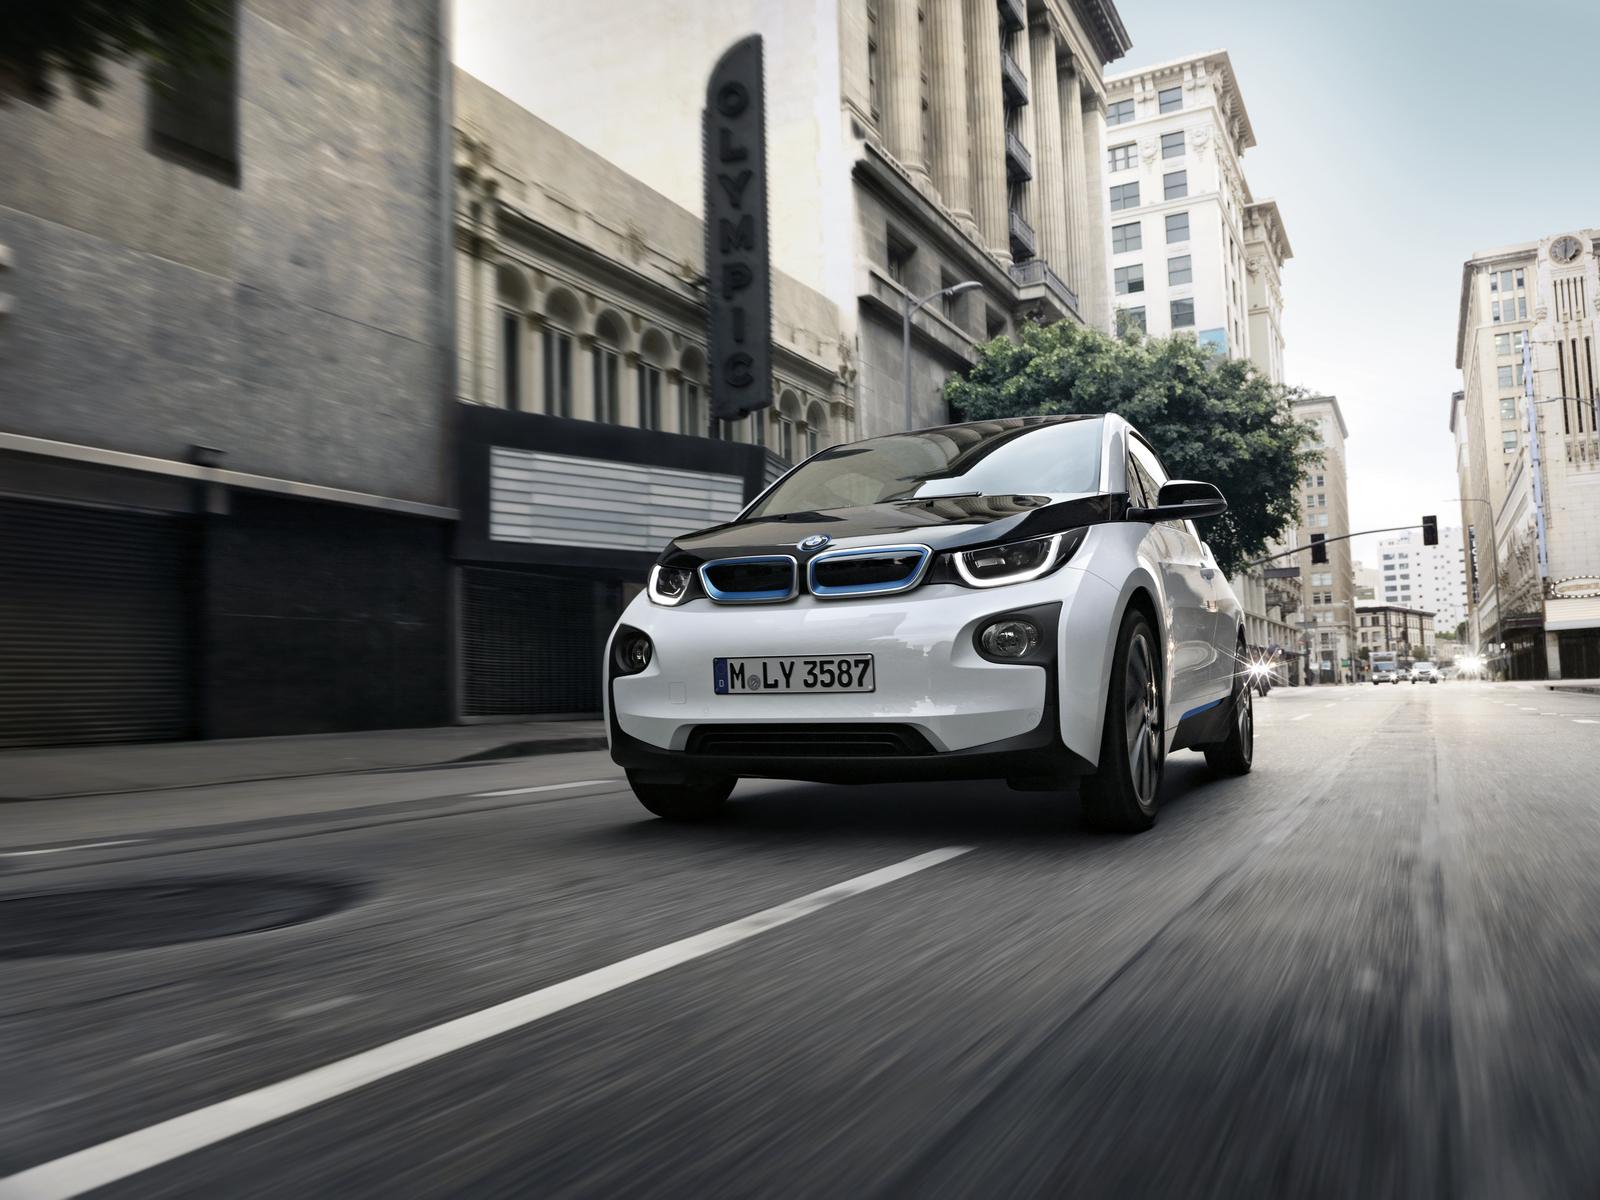 Suomeen kauan kaivattu BMW i3 sai hinnat